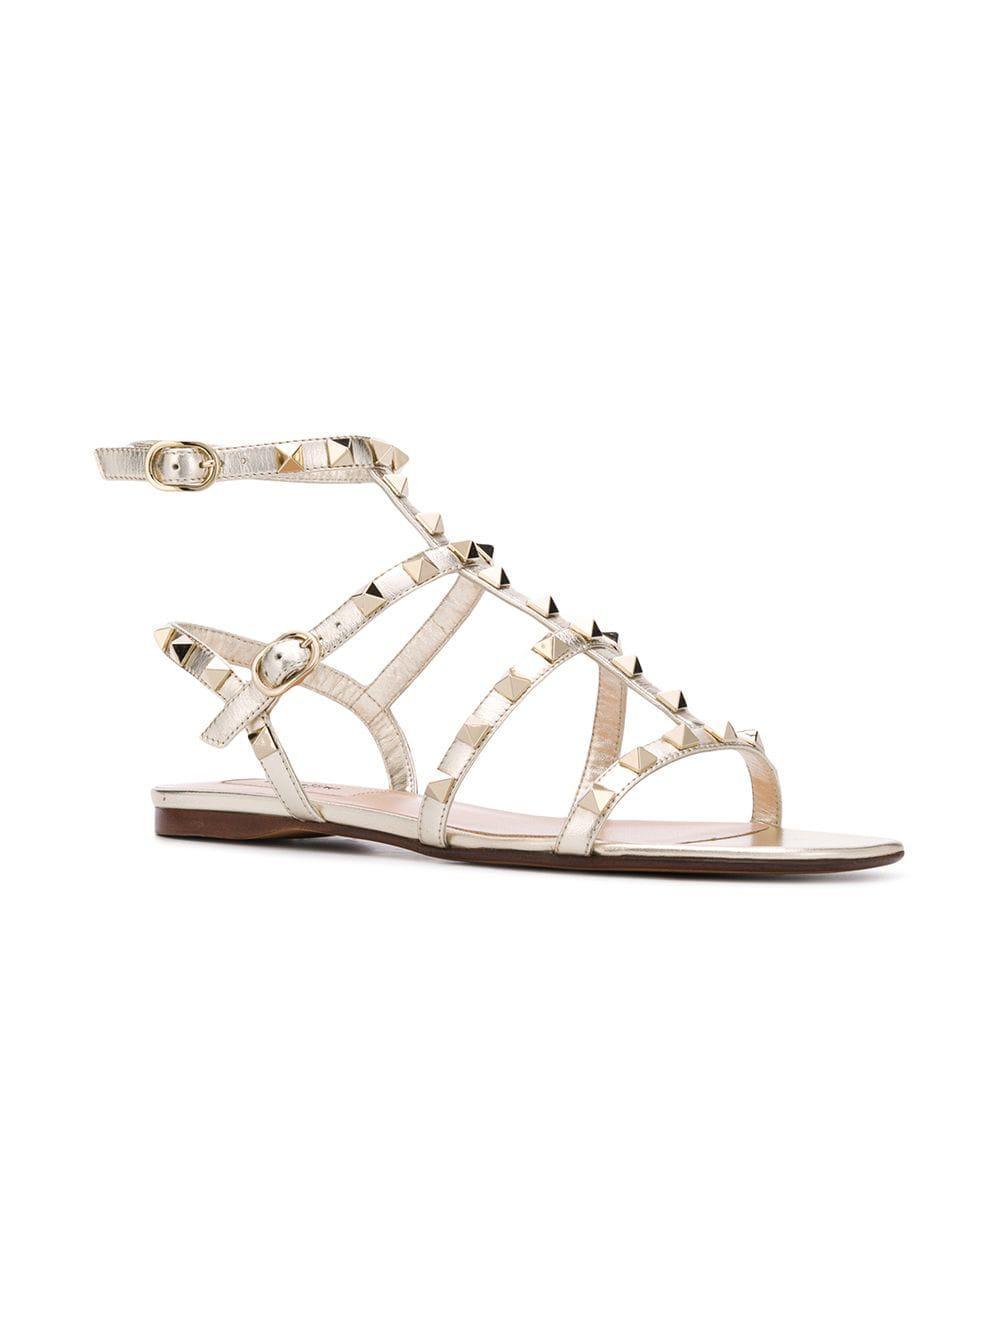 bf99e9f0ee2 Lyst - Valentino Garavani Rockstud Ankle Strap Sandals in Metallic